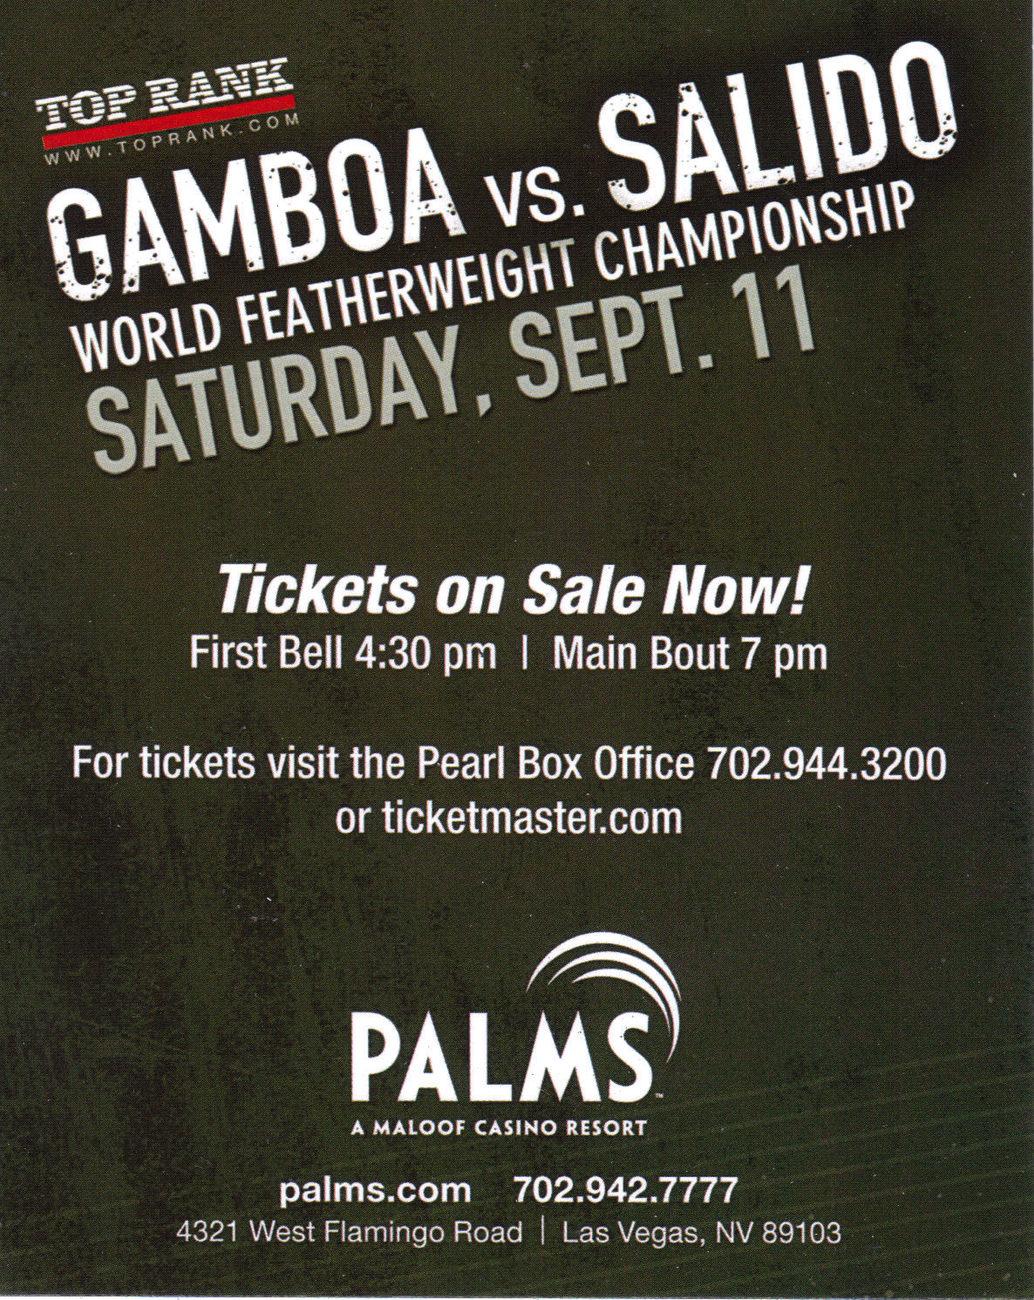 GAMBOA vs SALIDO + Notre Dame Champ  Mike Lee Sept. 11 2010